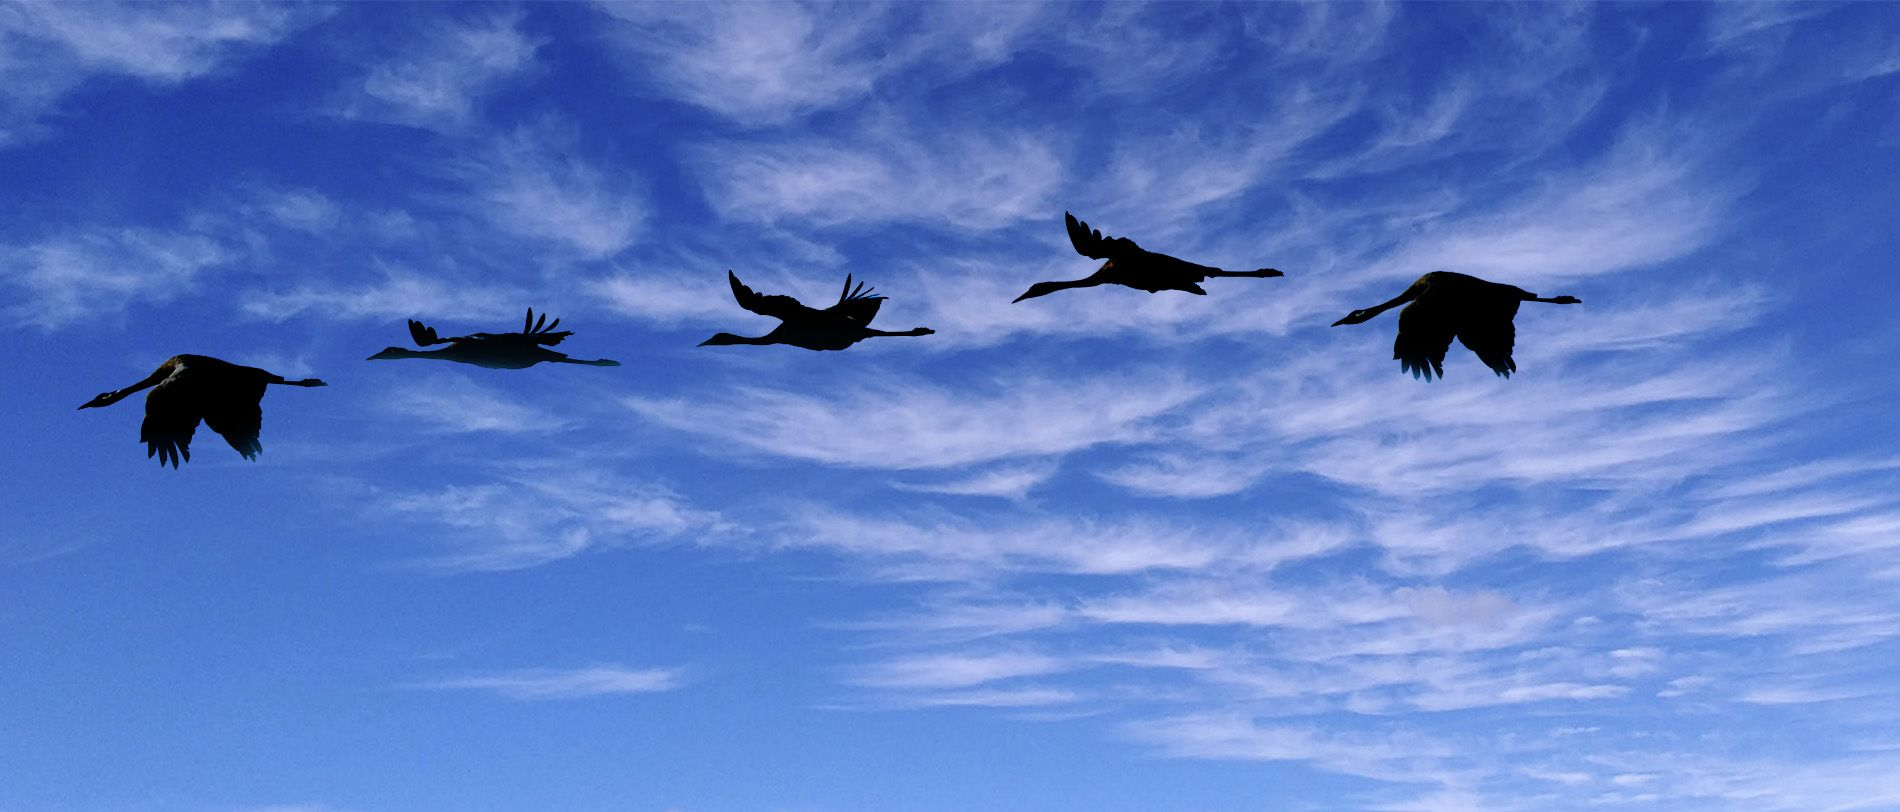 Grullas volando Exttremadura